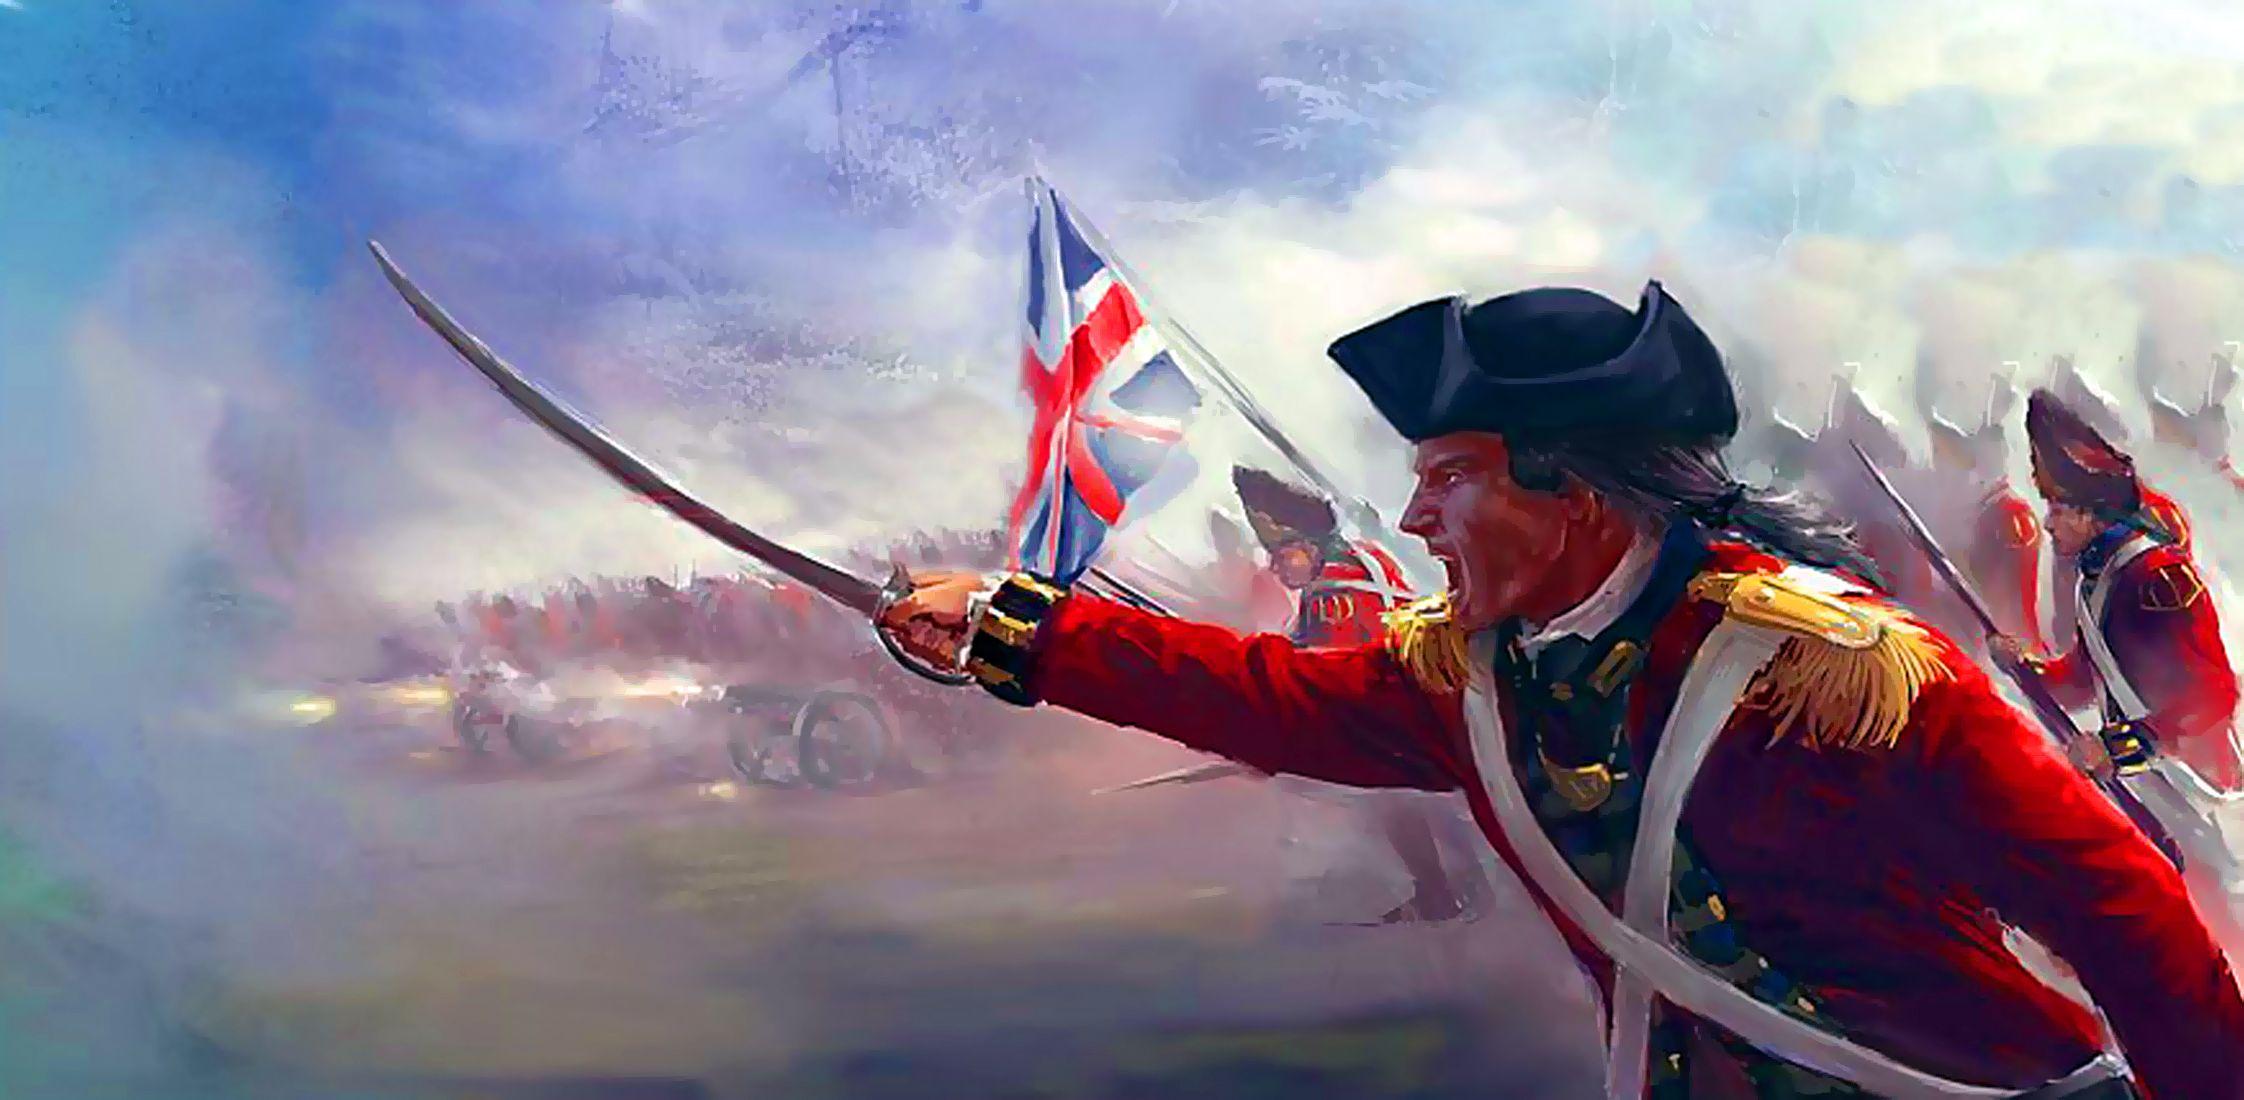 Ascendancy of the British empire American revolutionary